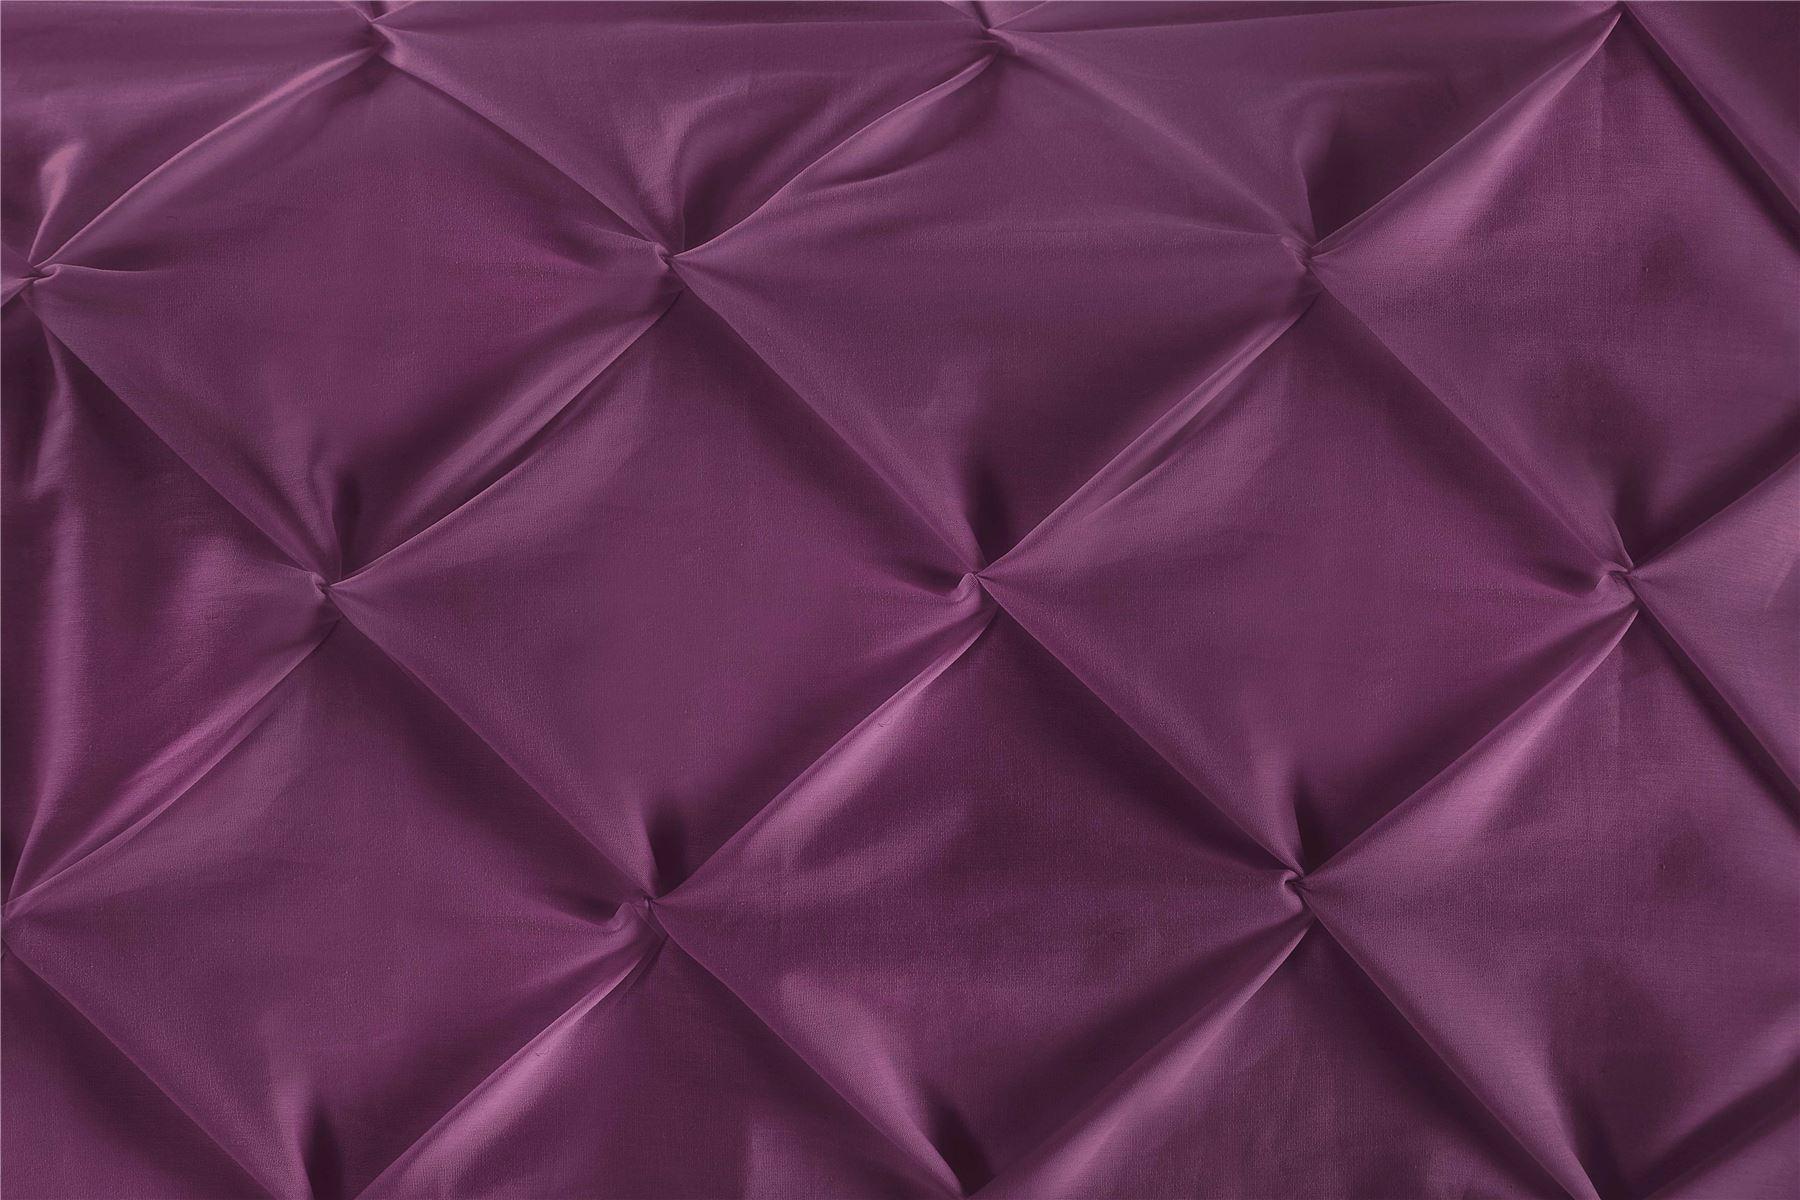 Luxury-Pure-100-Cotton-200-Thread-Pinch-Pleat-Pintuck-Puckering-Duvet-Cover-Set thumbnail 31